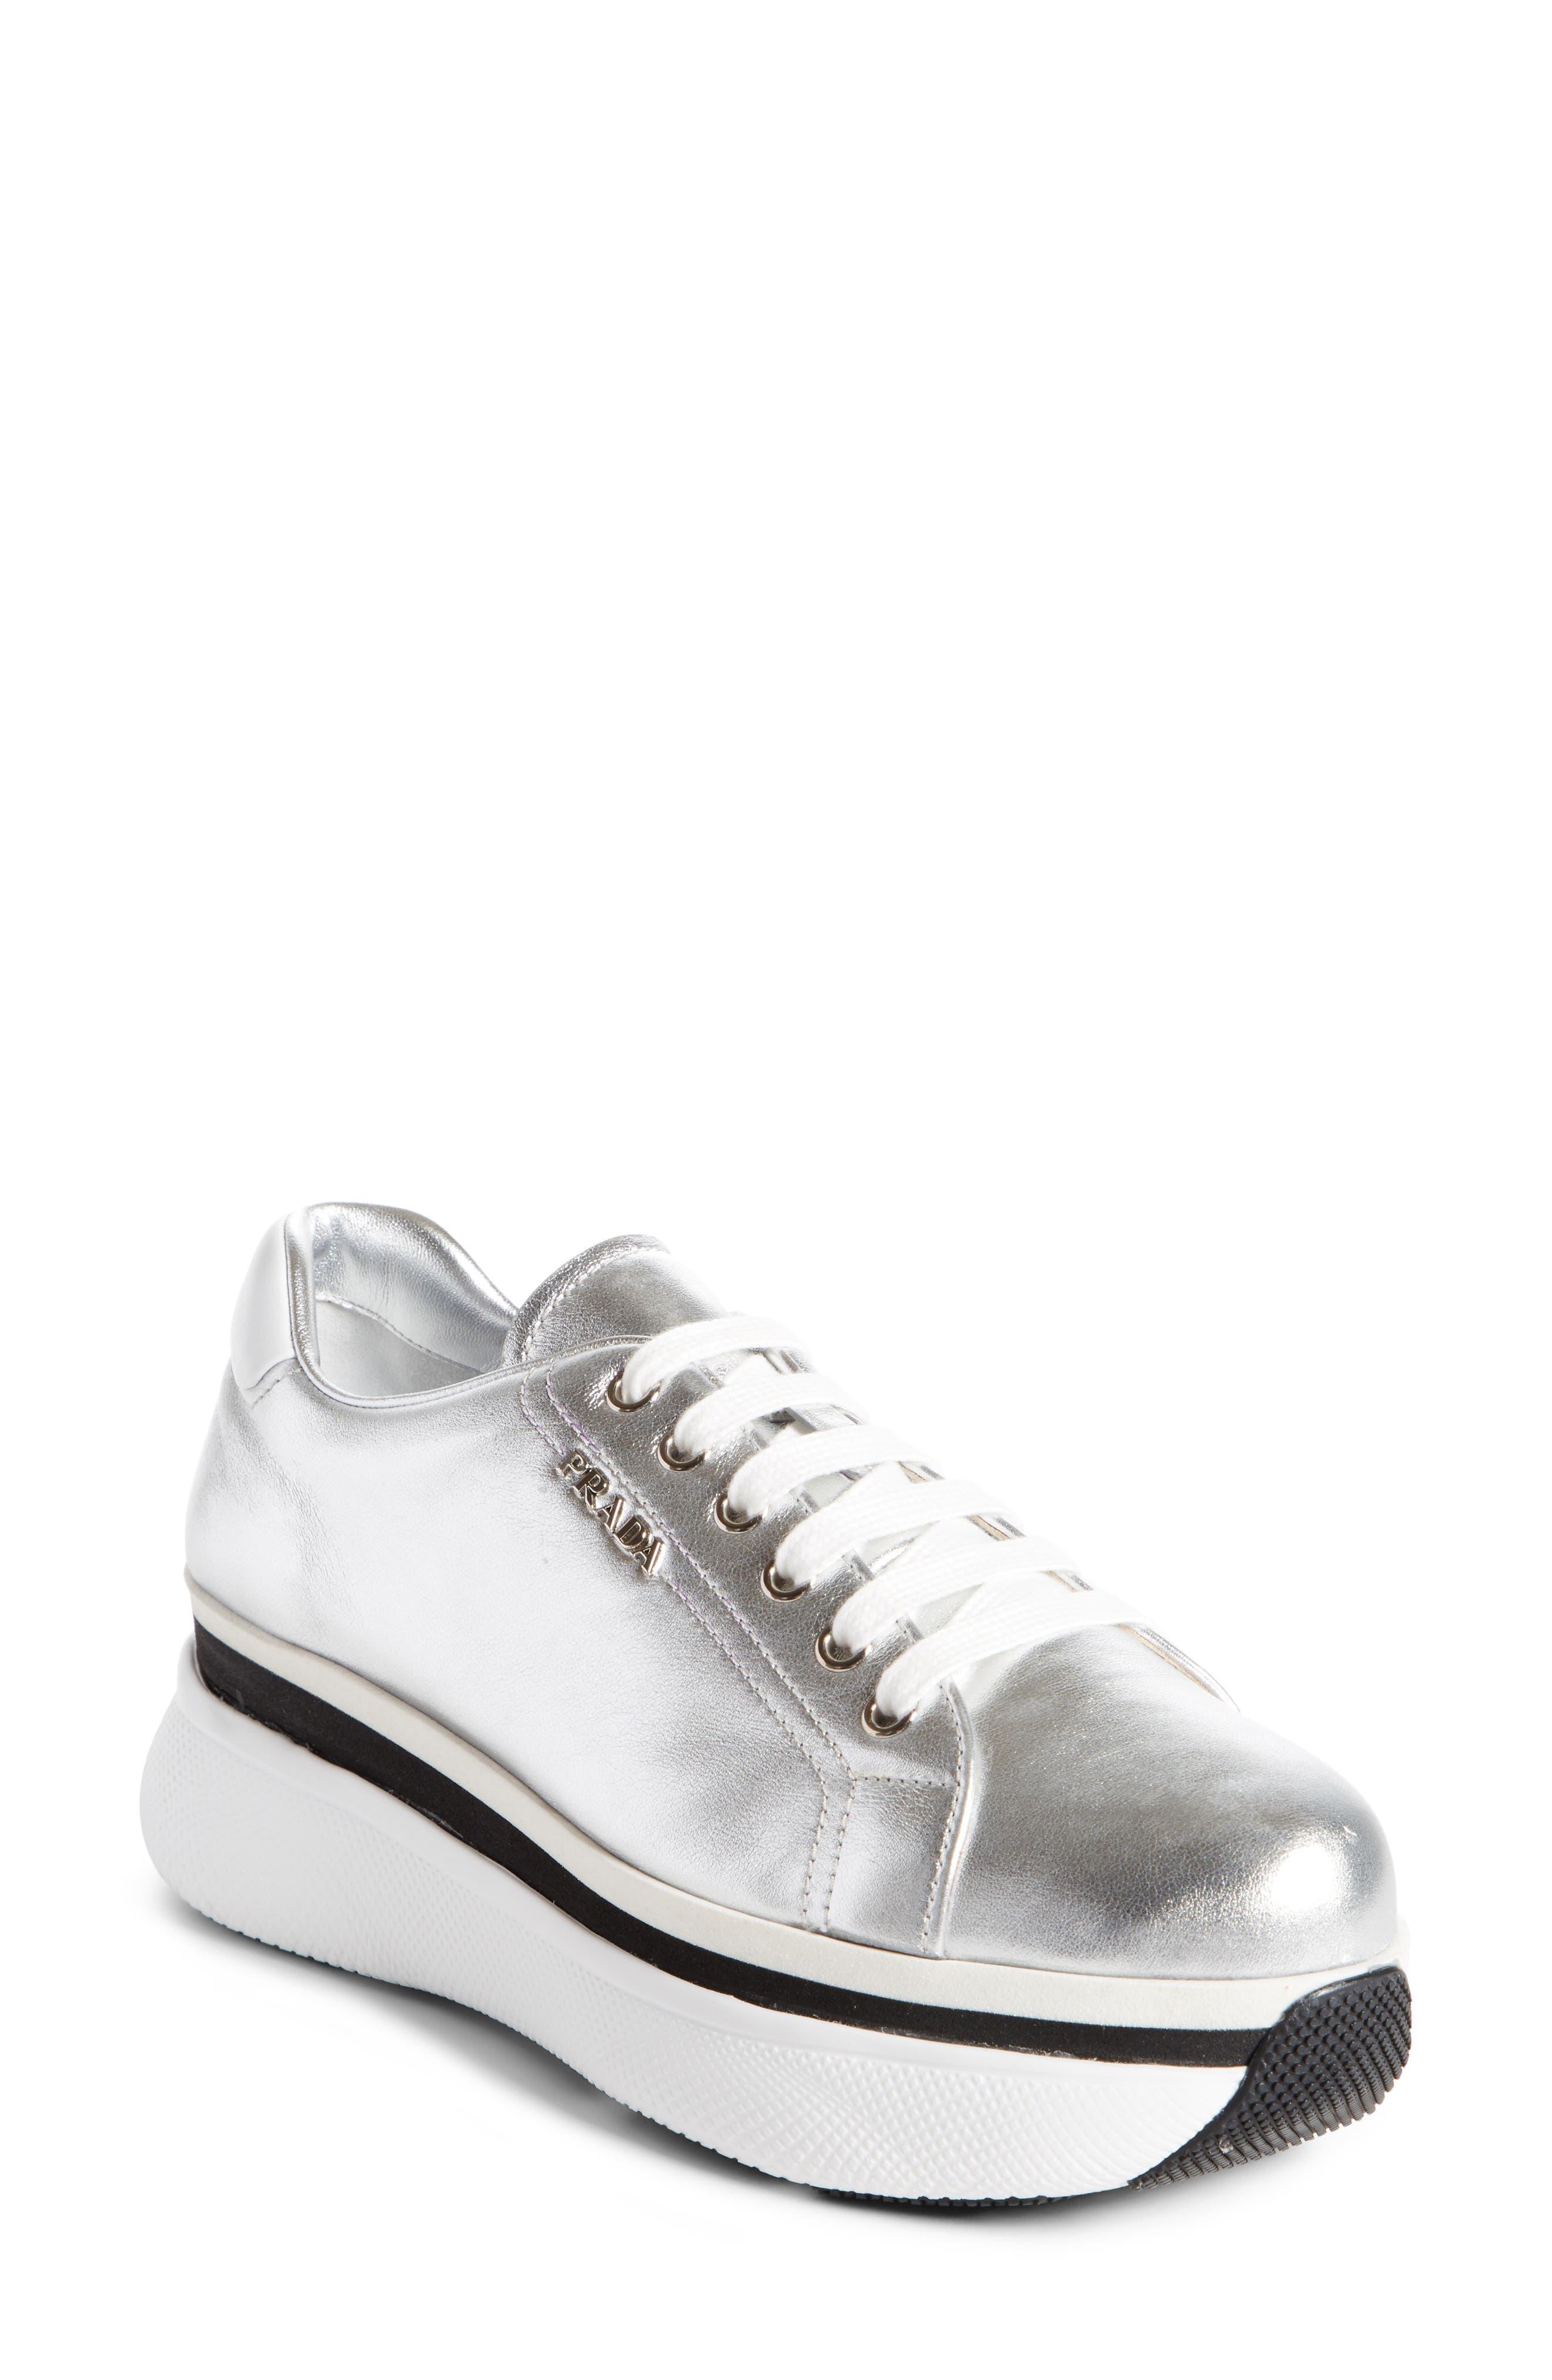 Platform Lace-Up Sneaker,                             Main thumbnail 1, color,                             Silver